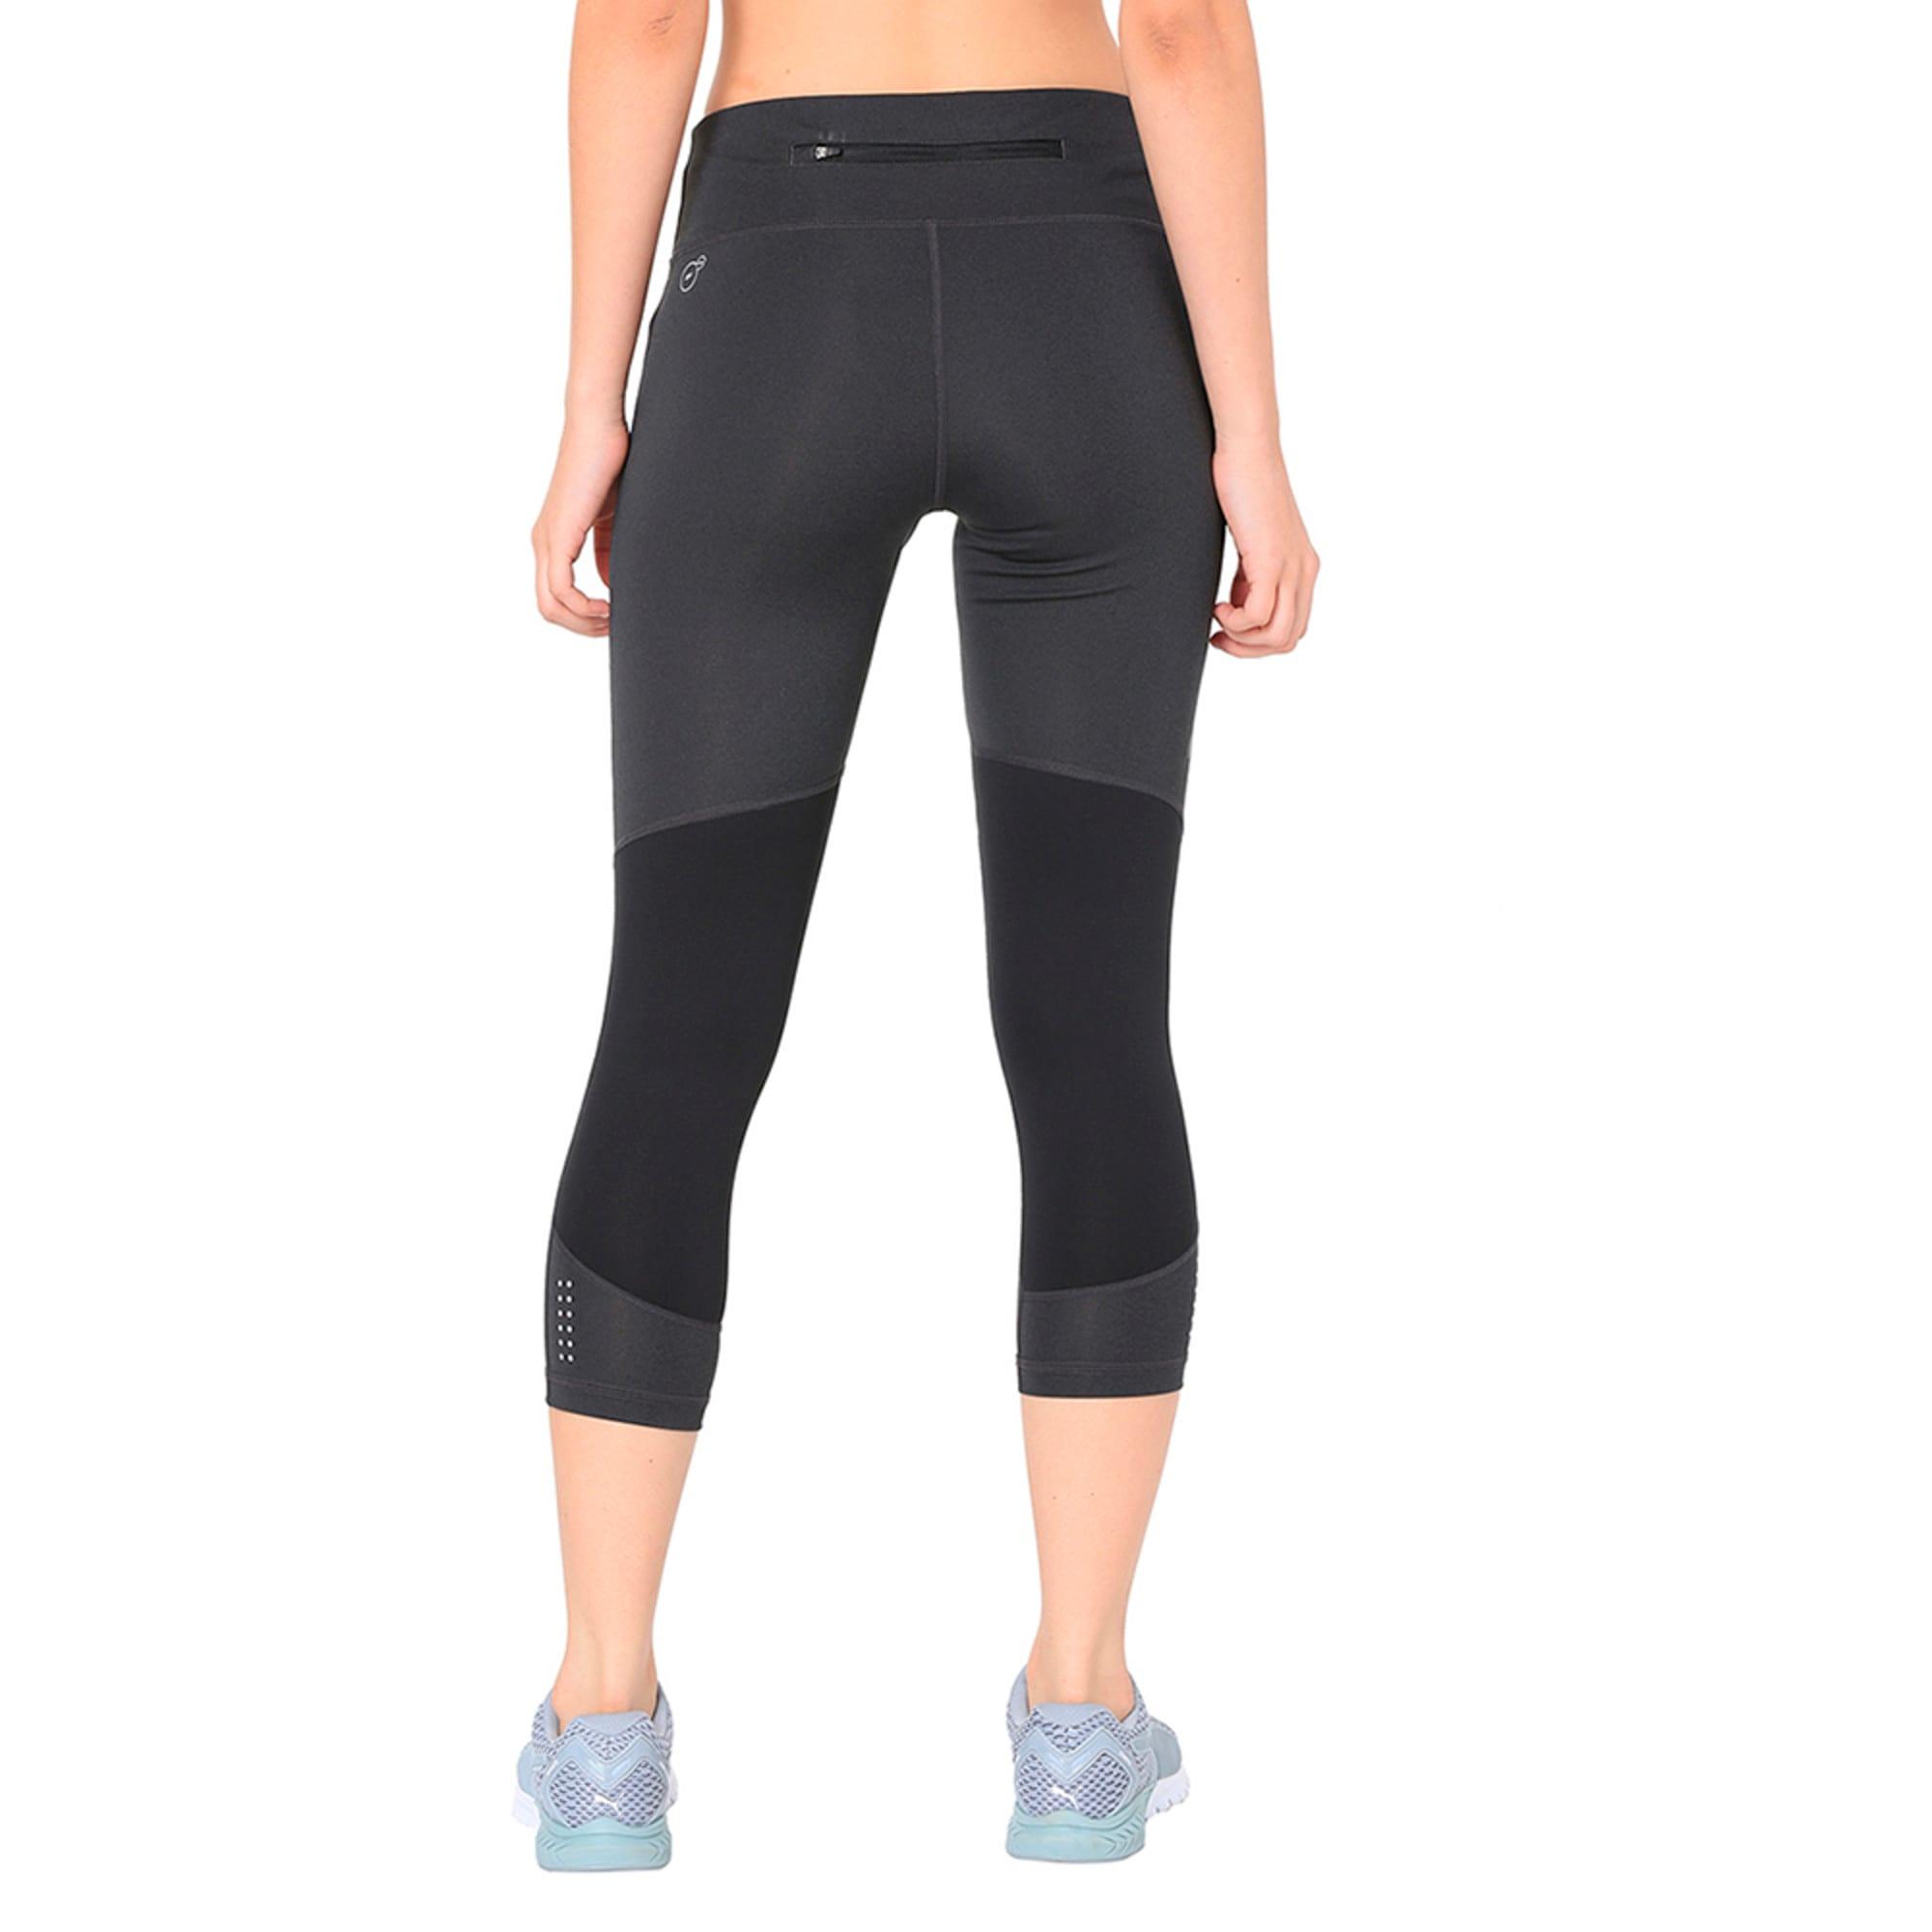 Thumbnail 3 of Speed 3/4 Women's Training Tights, Dark Gray Heather-Puma Black, medium-IND